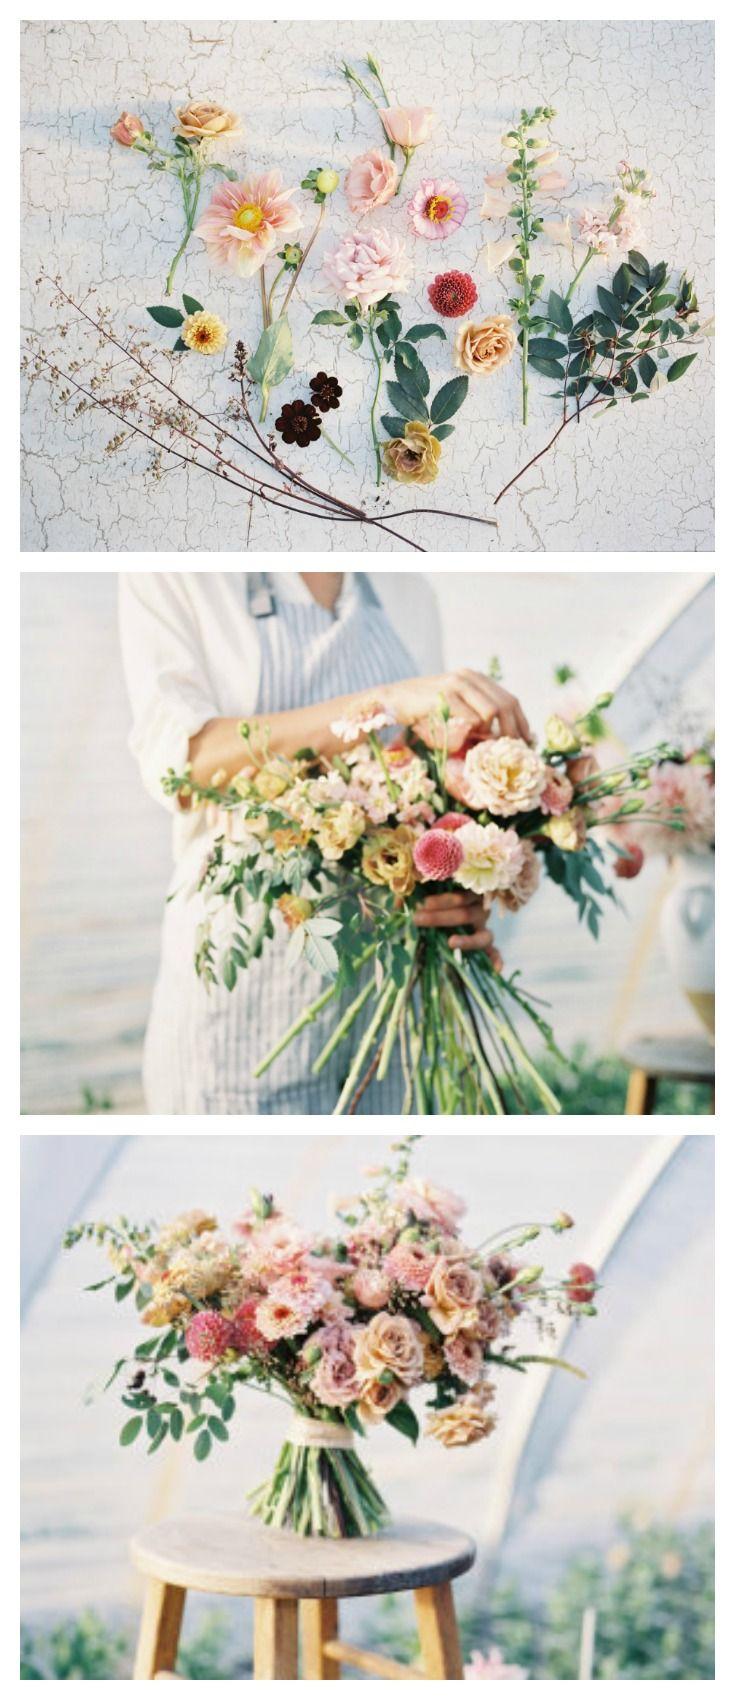 Diy hand tied garden style bridal bouquet wedding pinterest erin benzakein from floret demonstrates how to create a diy hand tied bouquet izmirmasajfo